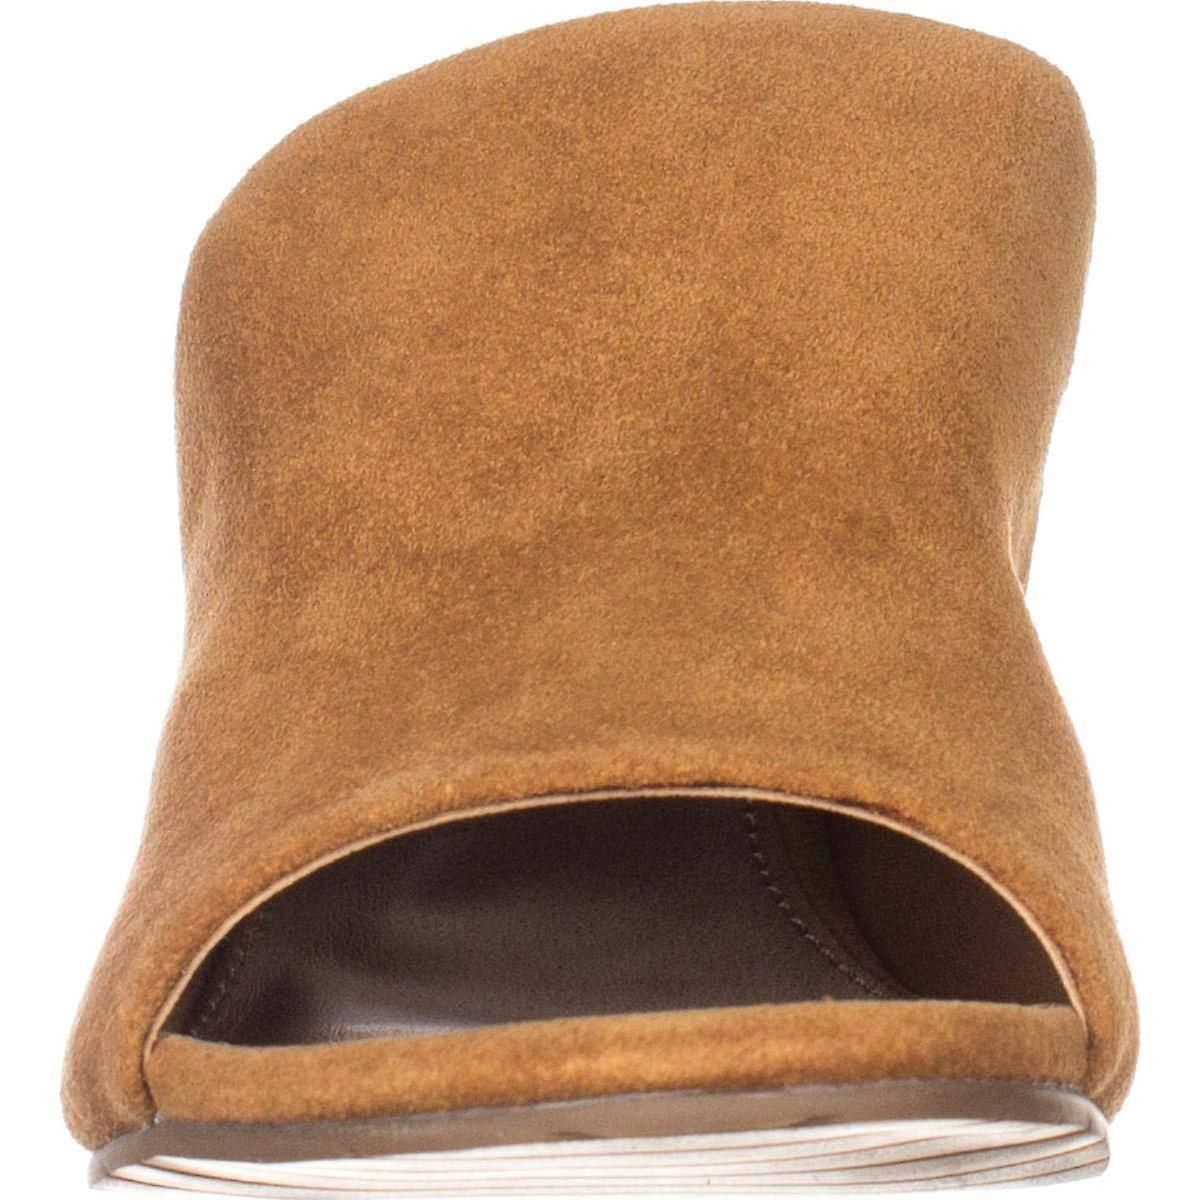 Kenneth Cole Reaction Womens Mass-ter-mind 7 Leather Peep Toe Casual Slide Sa...